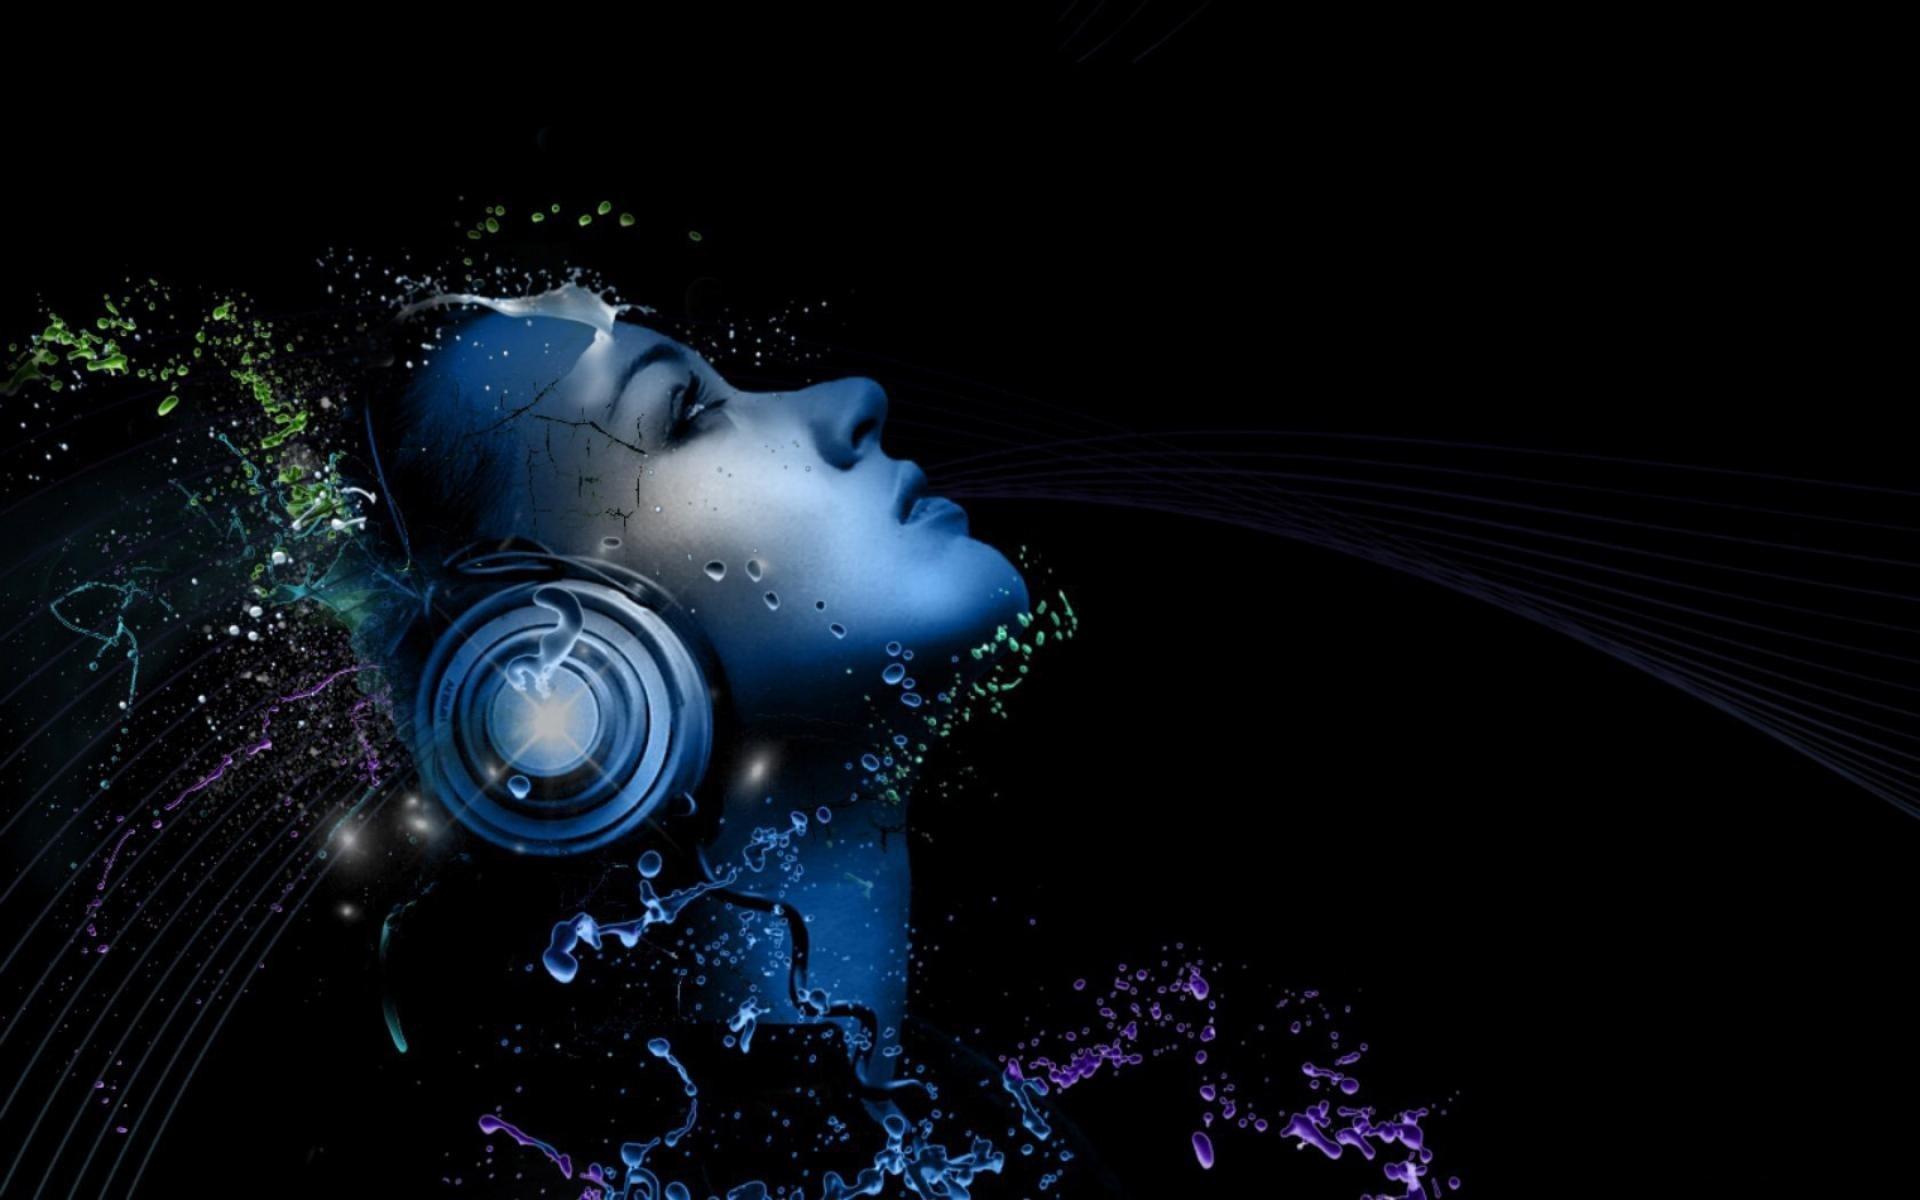 light headphones music headphones girl lines dj girls colors 1920x1200 wallpaper_www.wallpaperhi.com_15